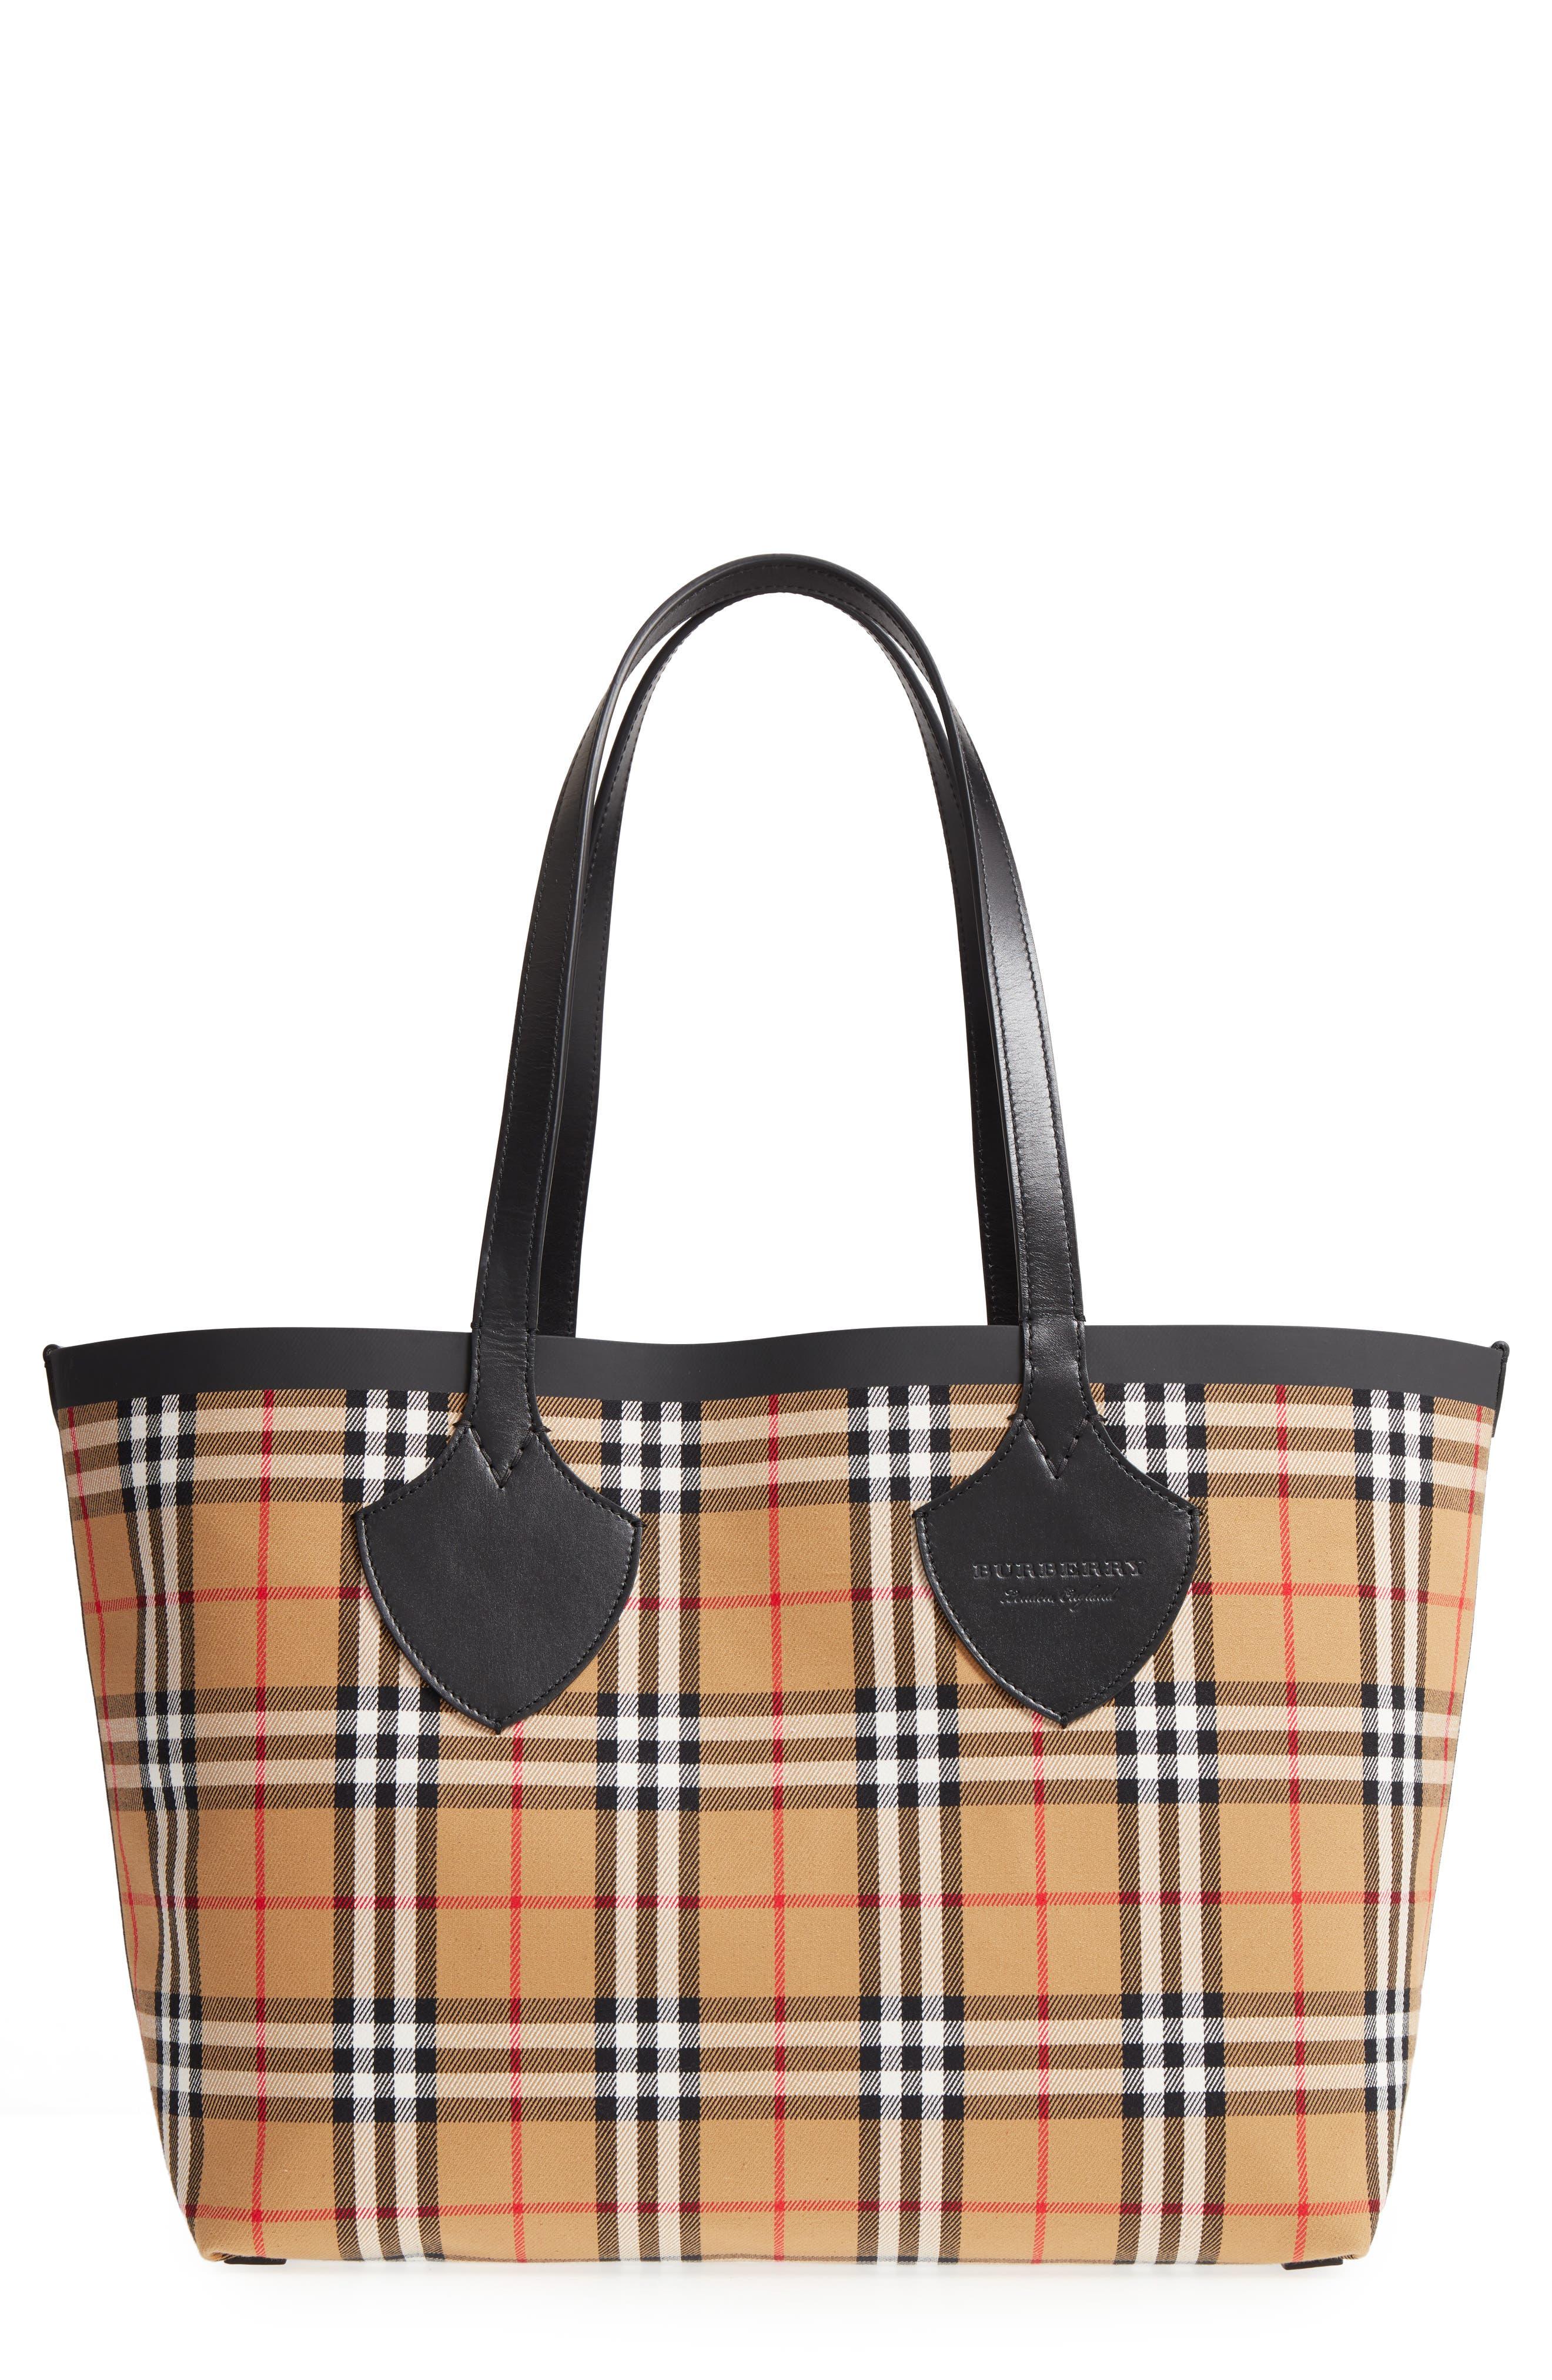 3d04b42f7e81 Burberry Women s Handbags